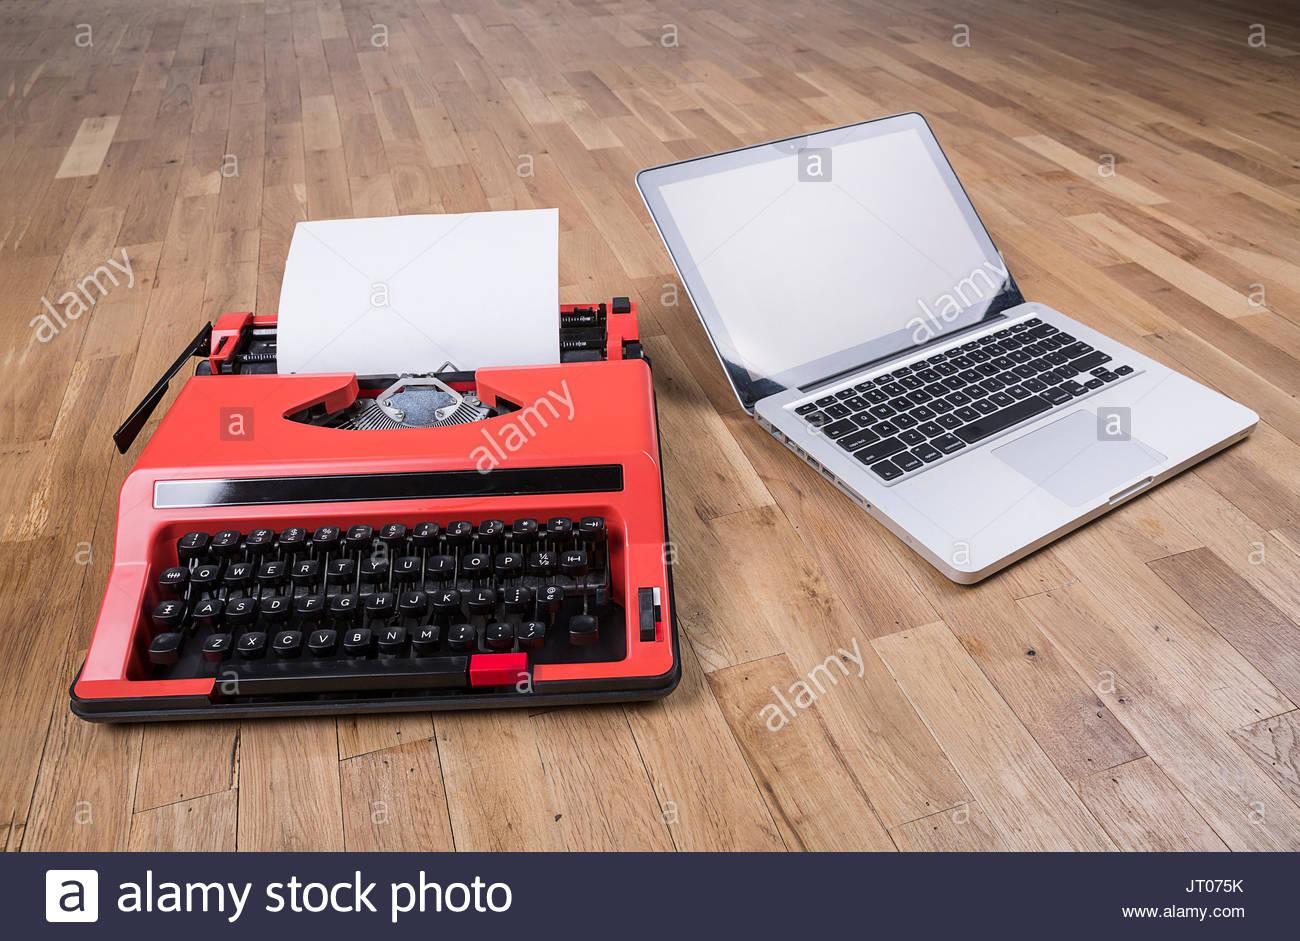 business,things,computer,modern,contemporary,evolution,evolution,evolution,portable computer,laptop,notebook computer,thin,nostalgic,sometimes,old,progress,progress,retro,renaissance,style,technology,technology,typewriter,type,view - Stock Image